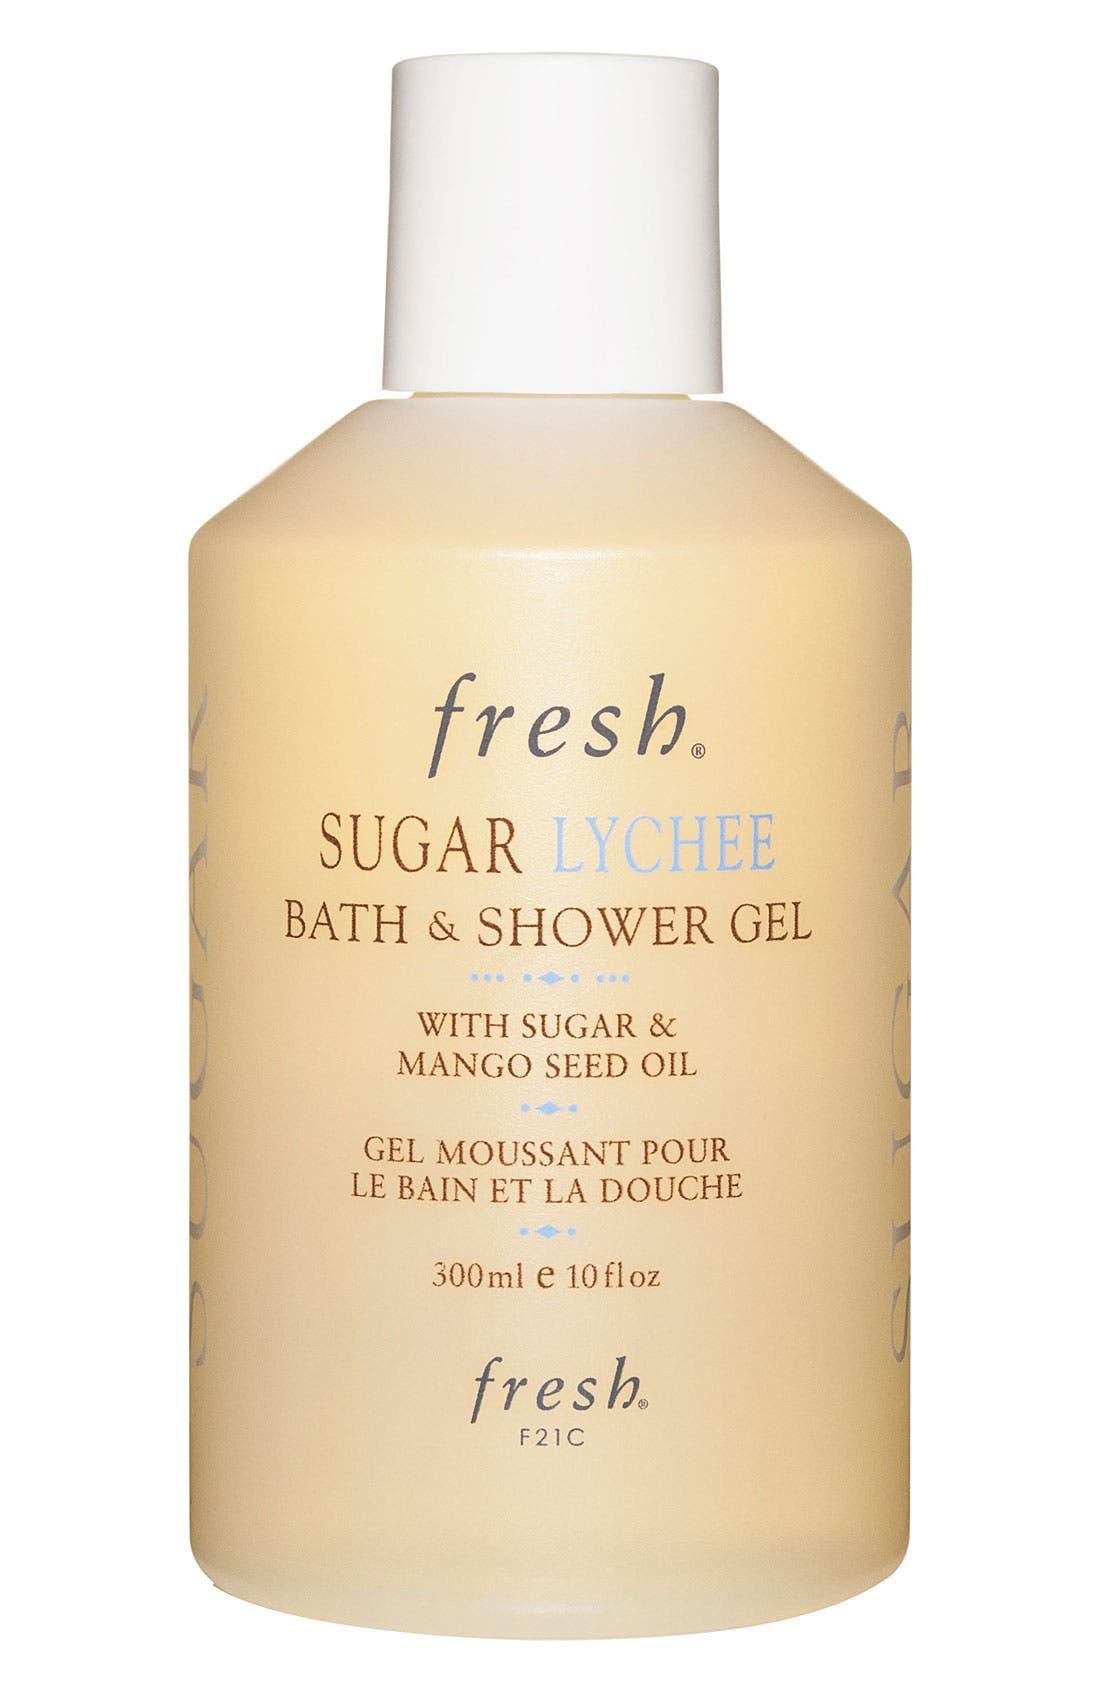 Sugar Lychee Bath & Shower Gel,                             Main thumbnail 1, color,                             NO COLOR